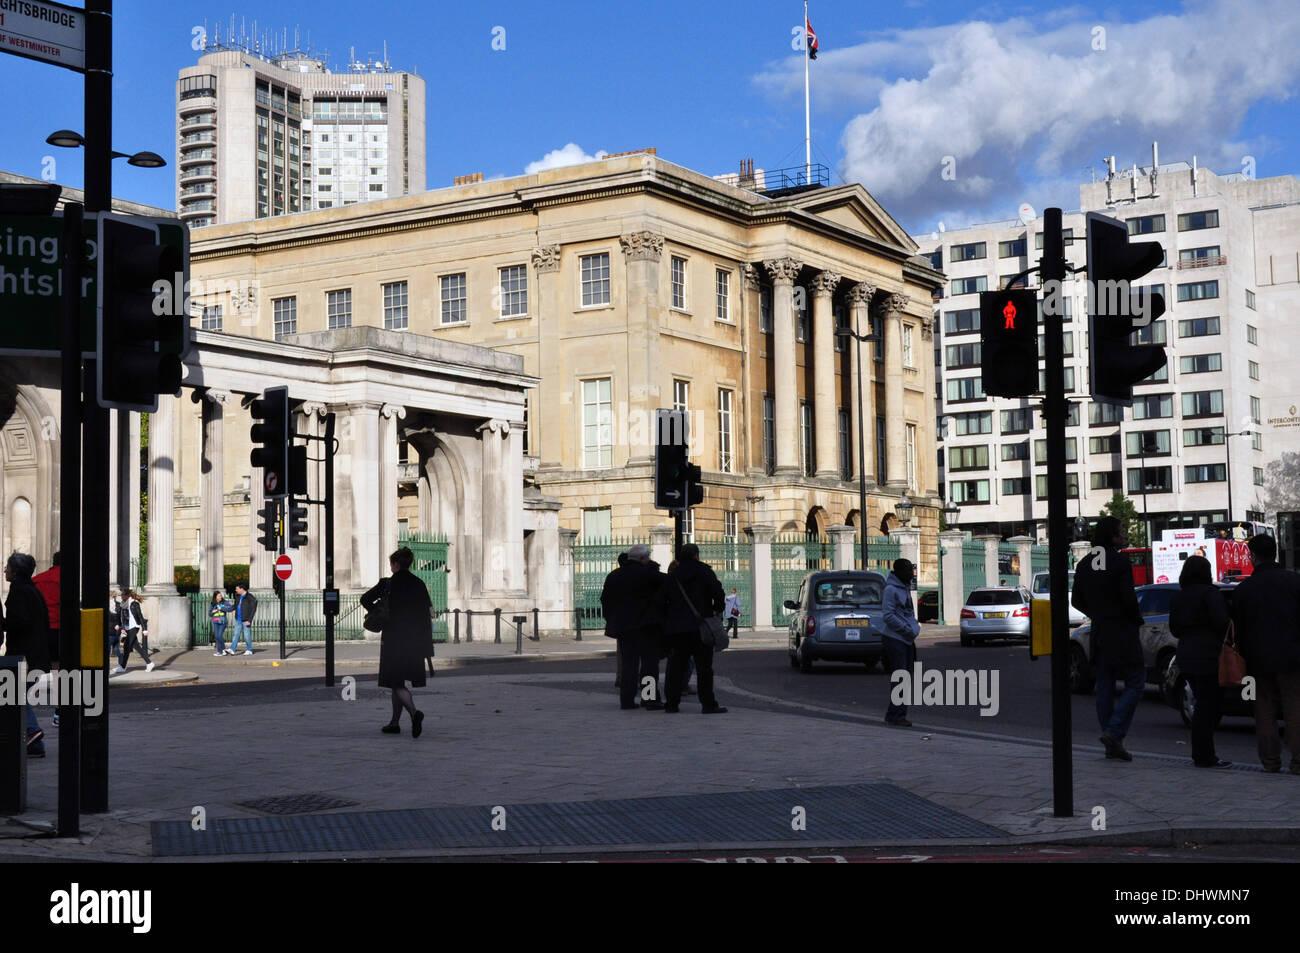 APSLEY HOUSE HYDE PARK CORNER LONDON UK - Stock Image